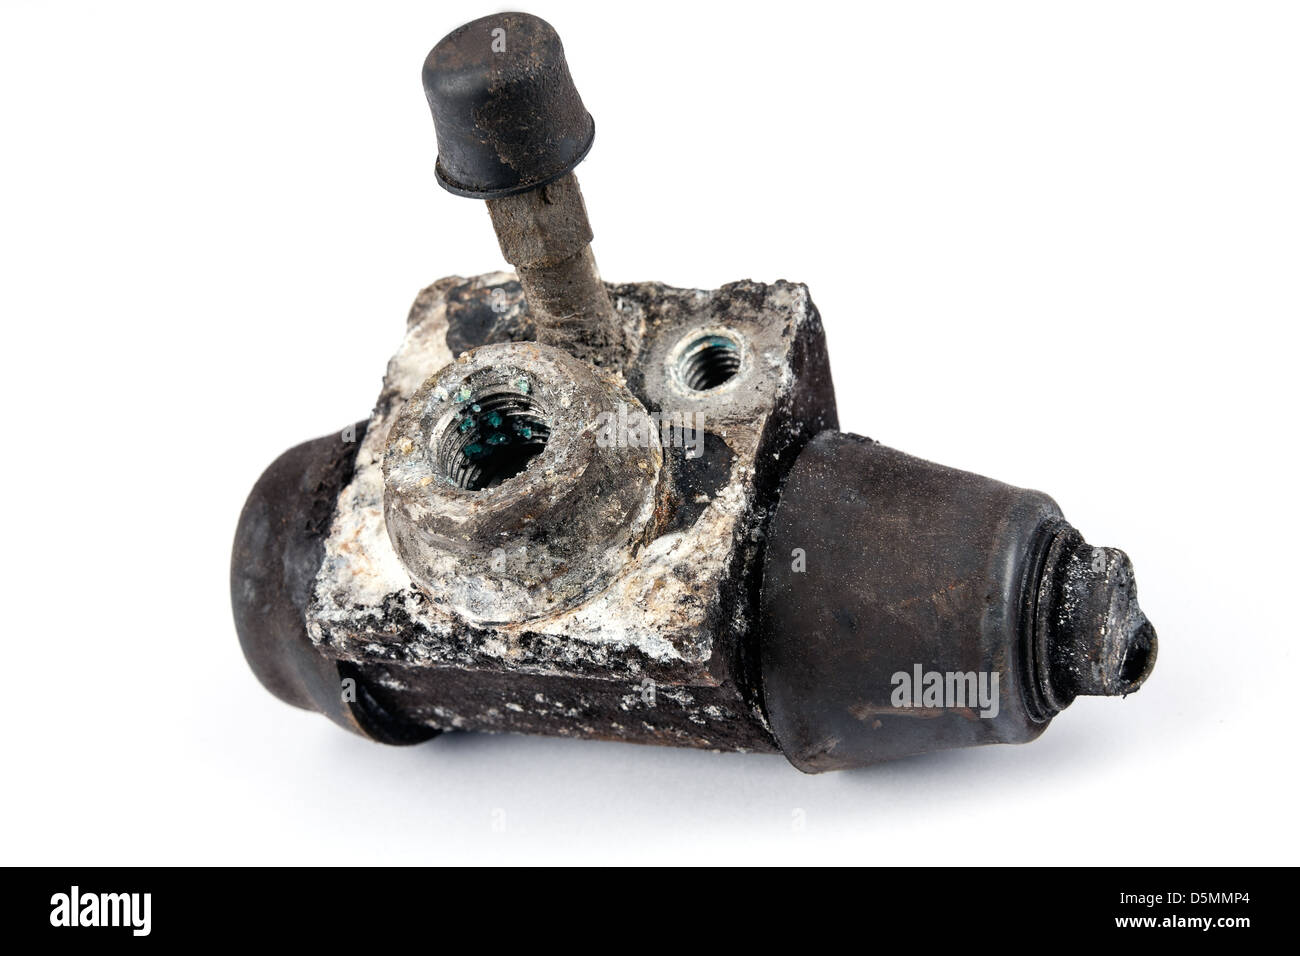 Worn out brake cylinder - Stock Image